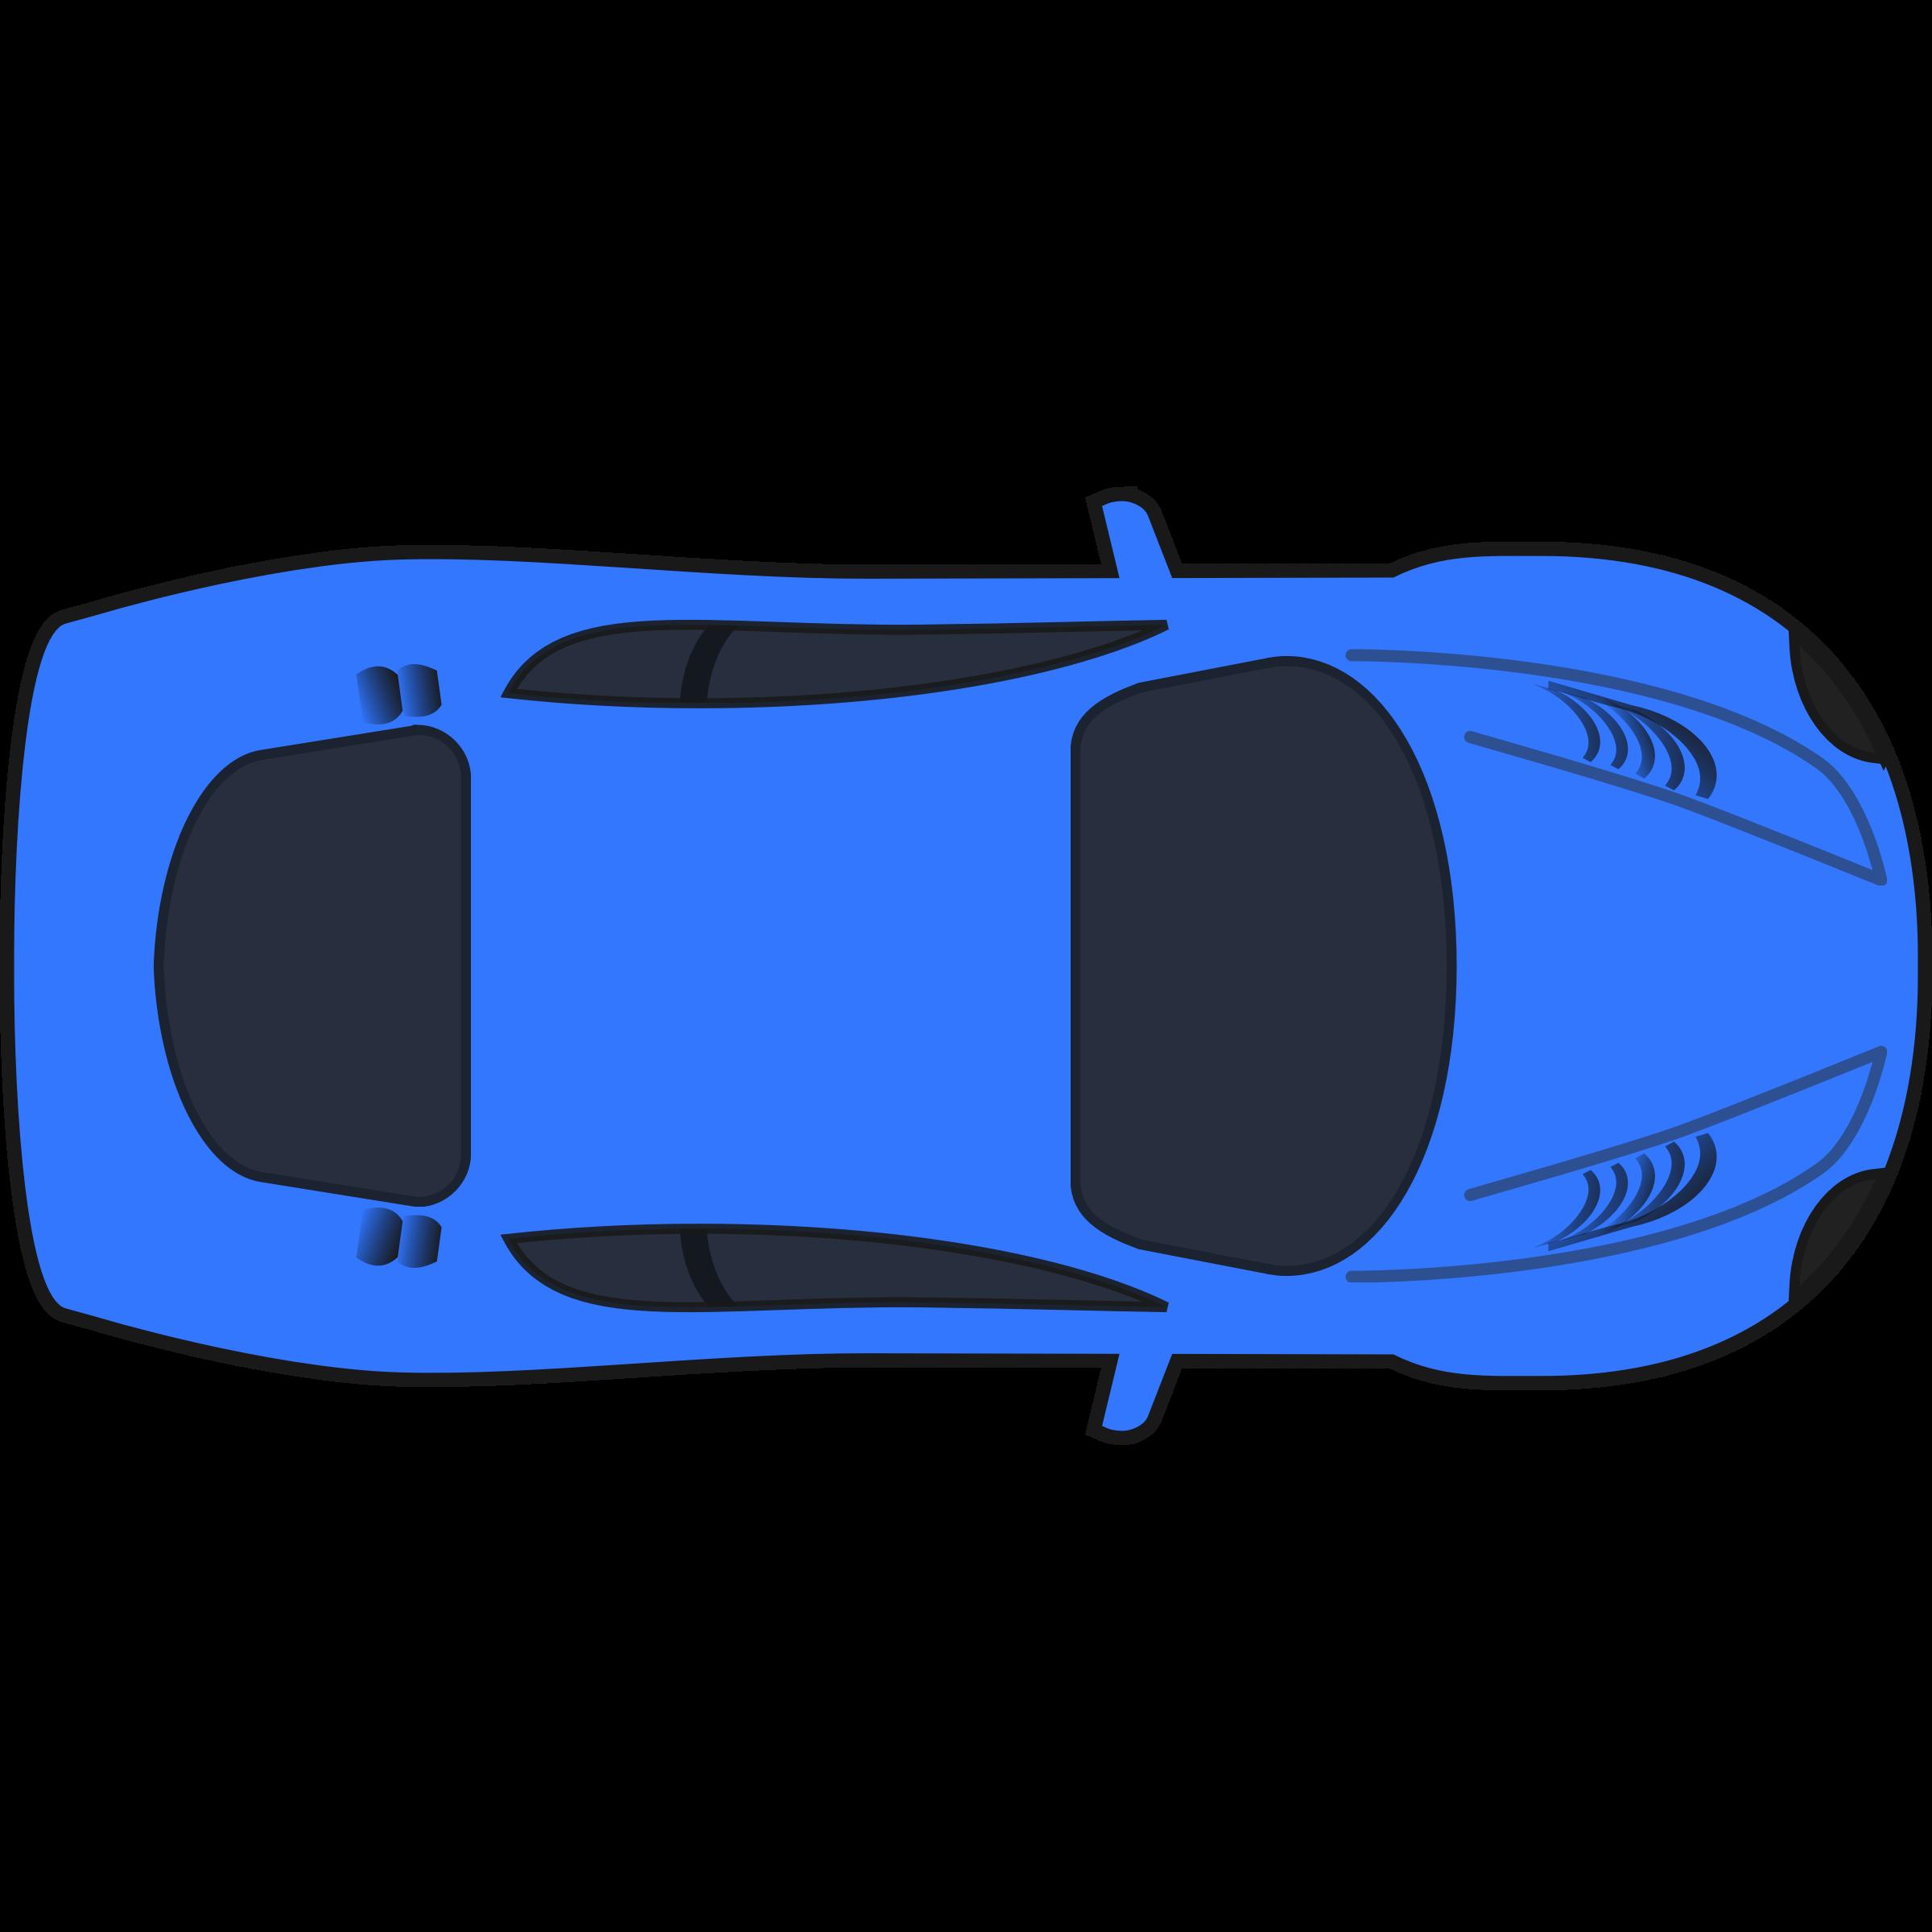 2400x2400 Best Car Clipart Top View